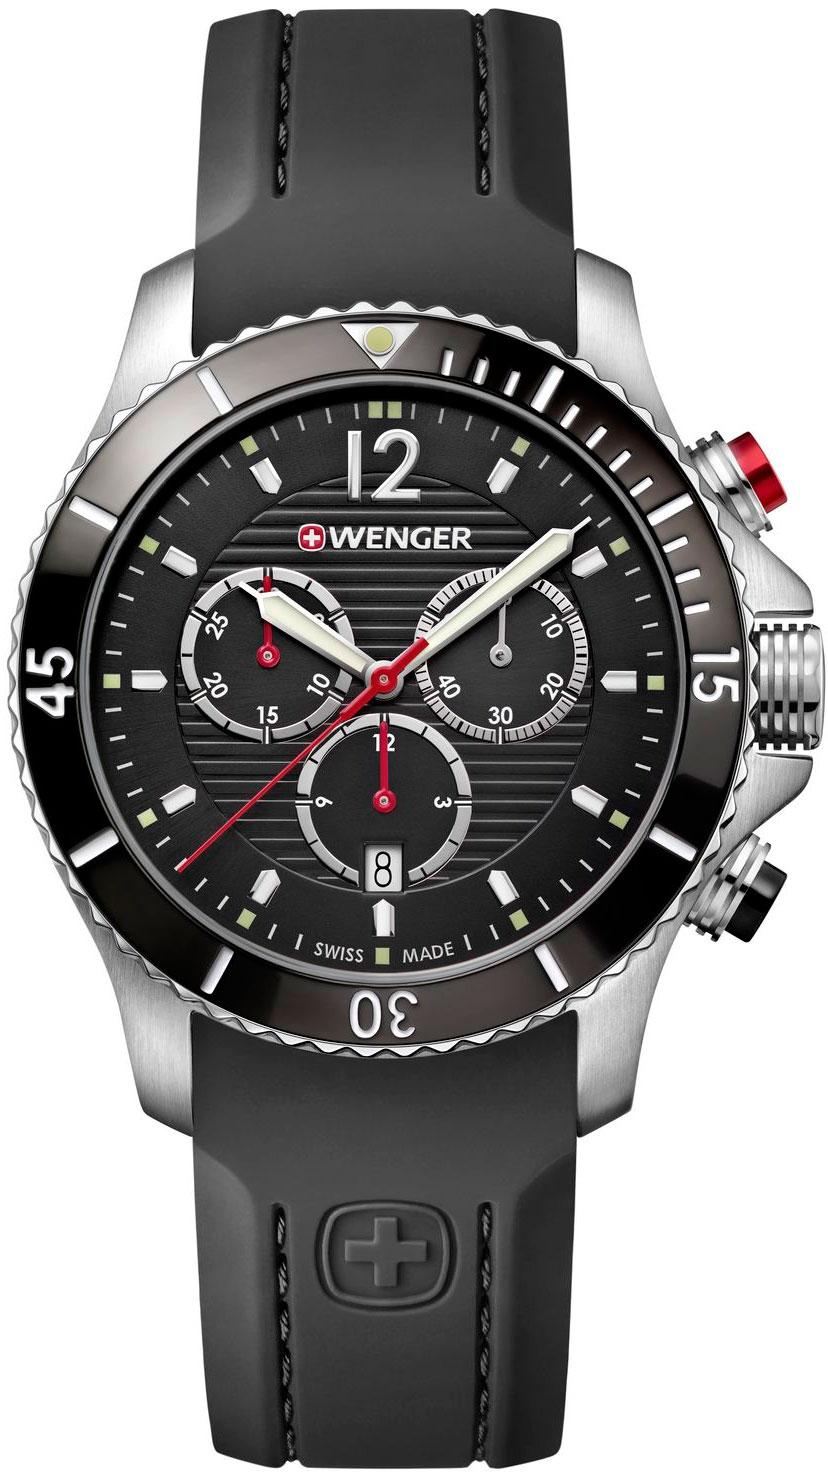 Фото «Швейцарские наручные часы Wenger 01.0643.108 с хронографом»